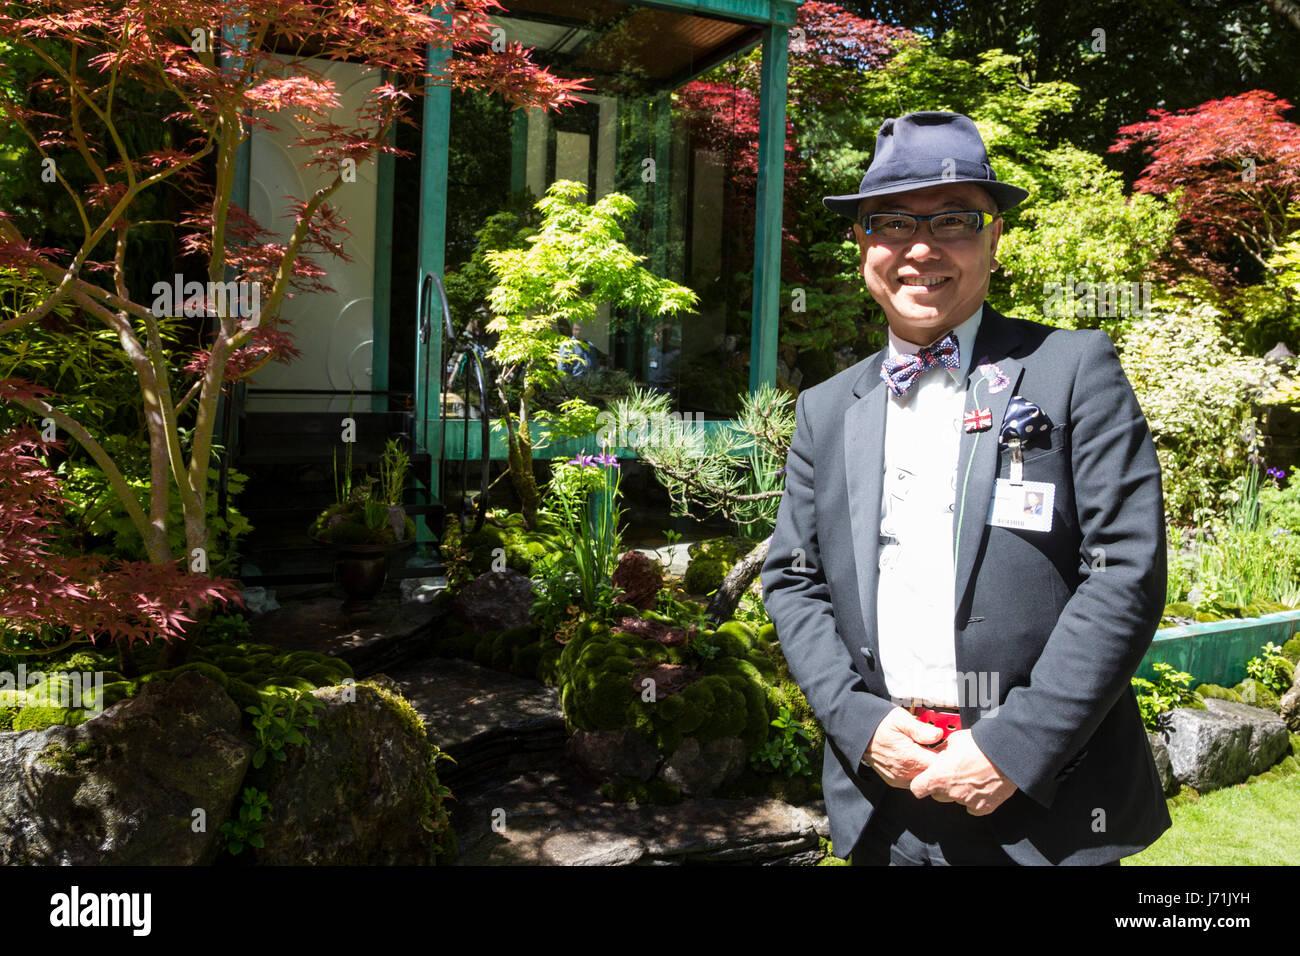 london, uk. 22nd may, 2017. garden designer ishihara kazuyuki. press